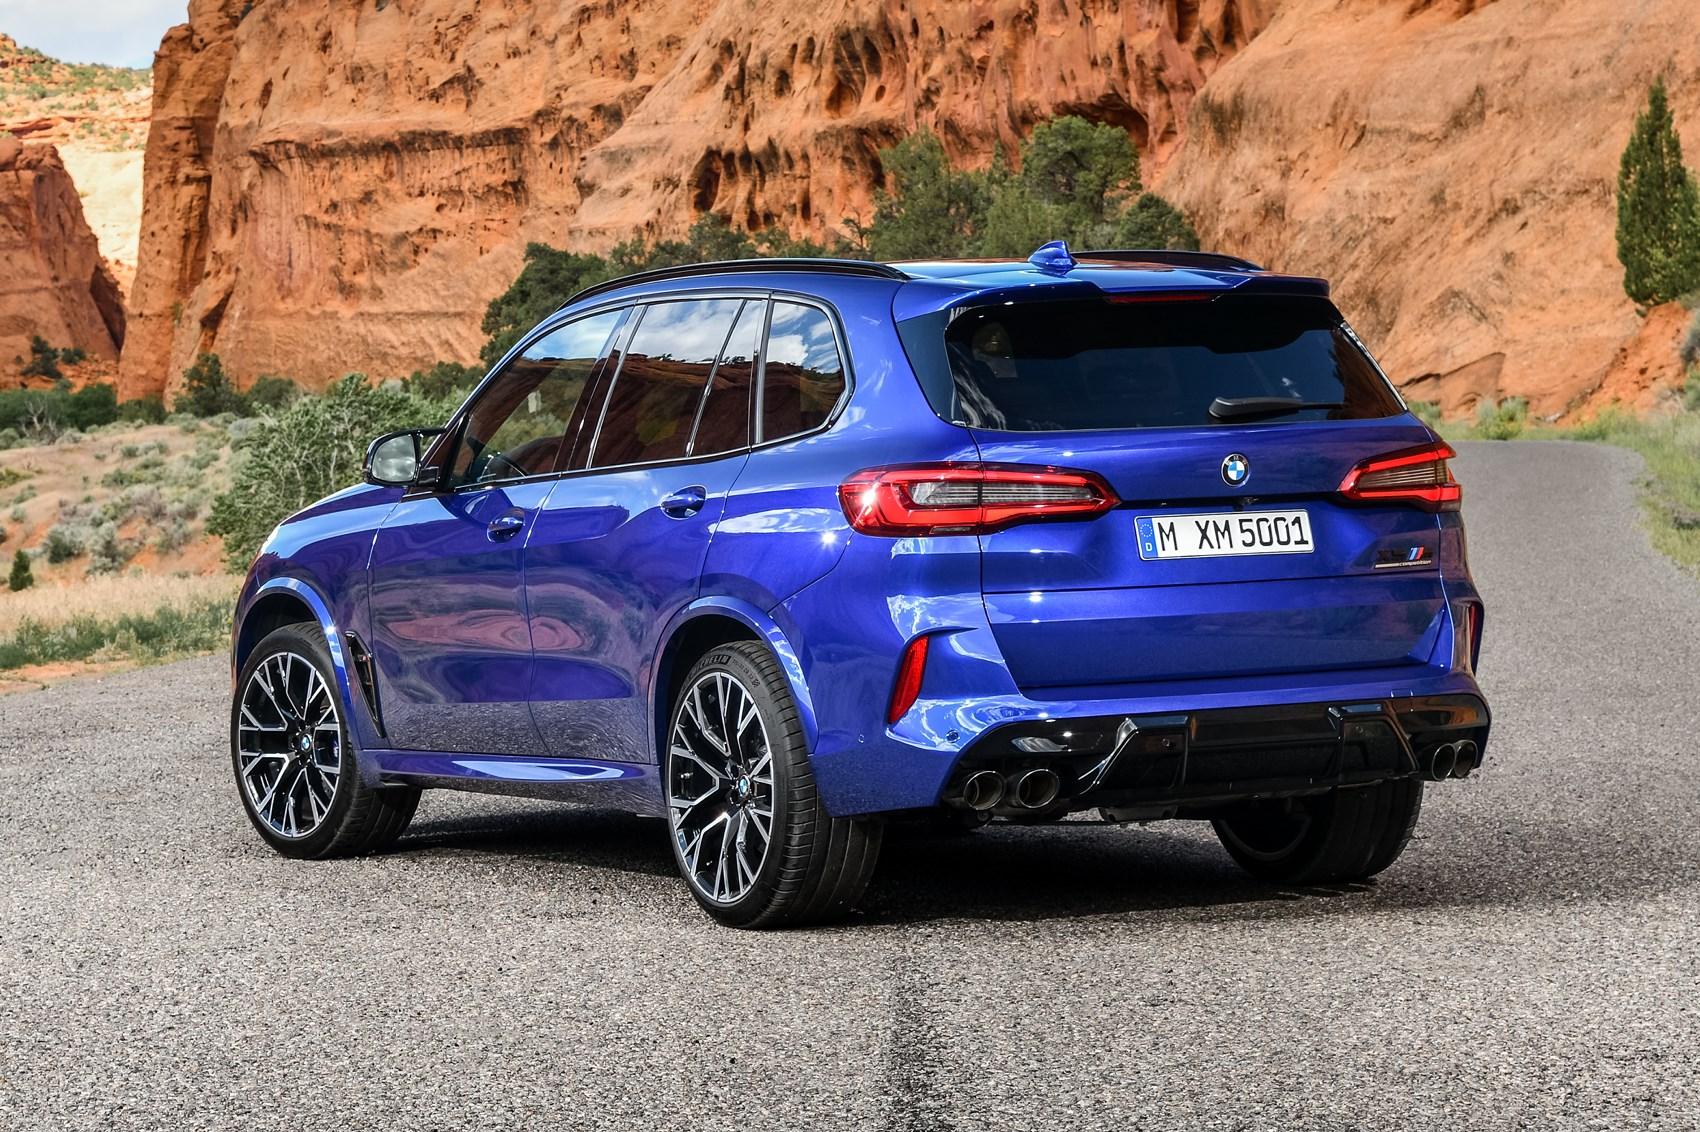 New 616bhp Bmw X5 M Competition Joins Suv Range Car Magazine